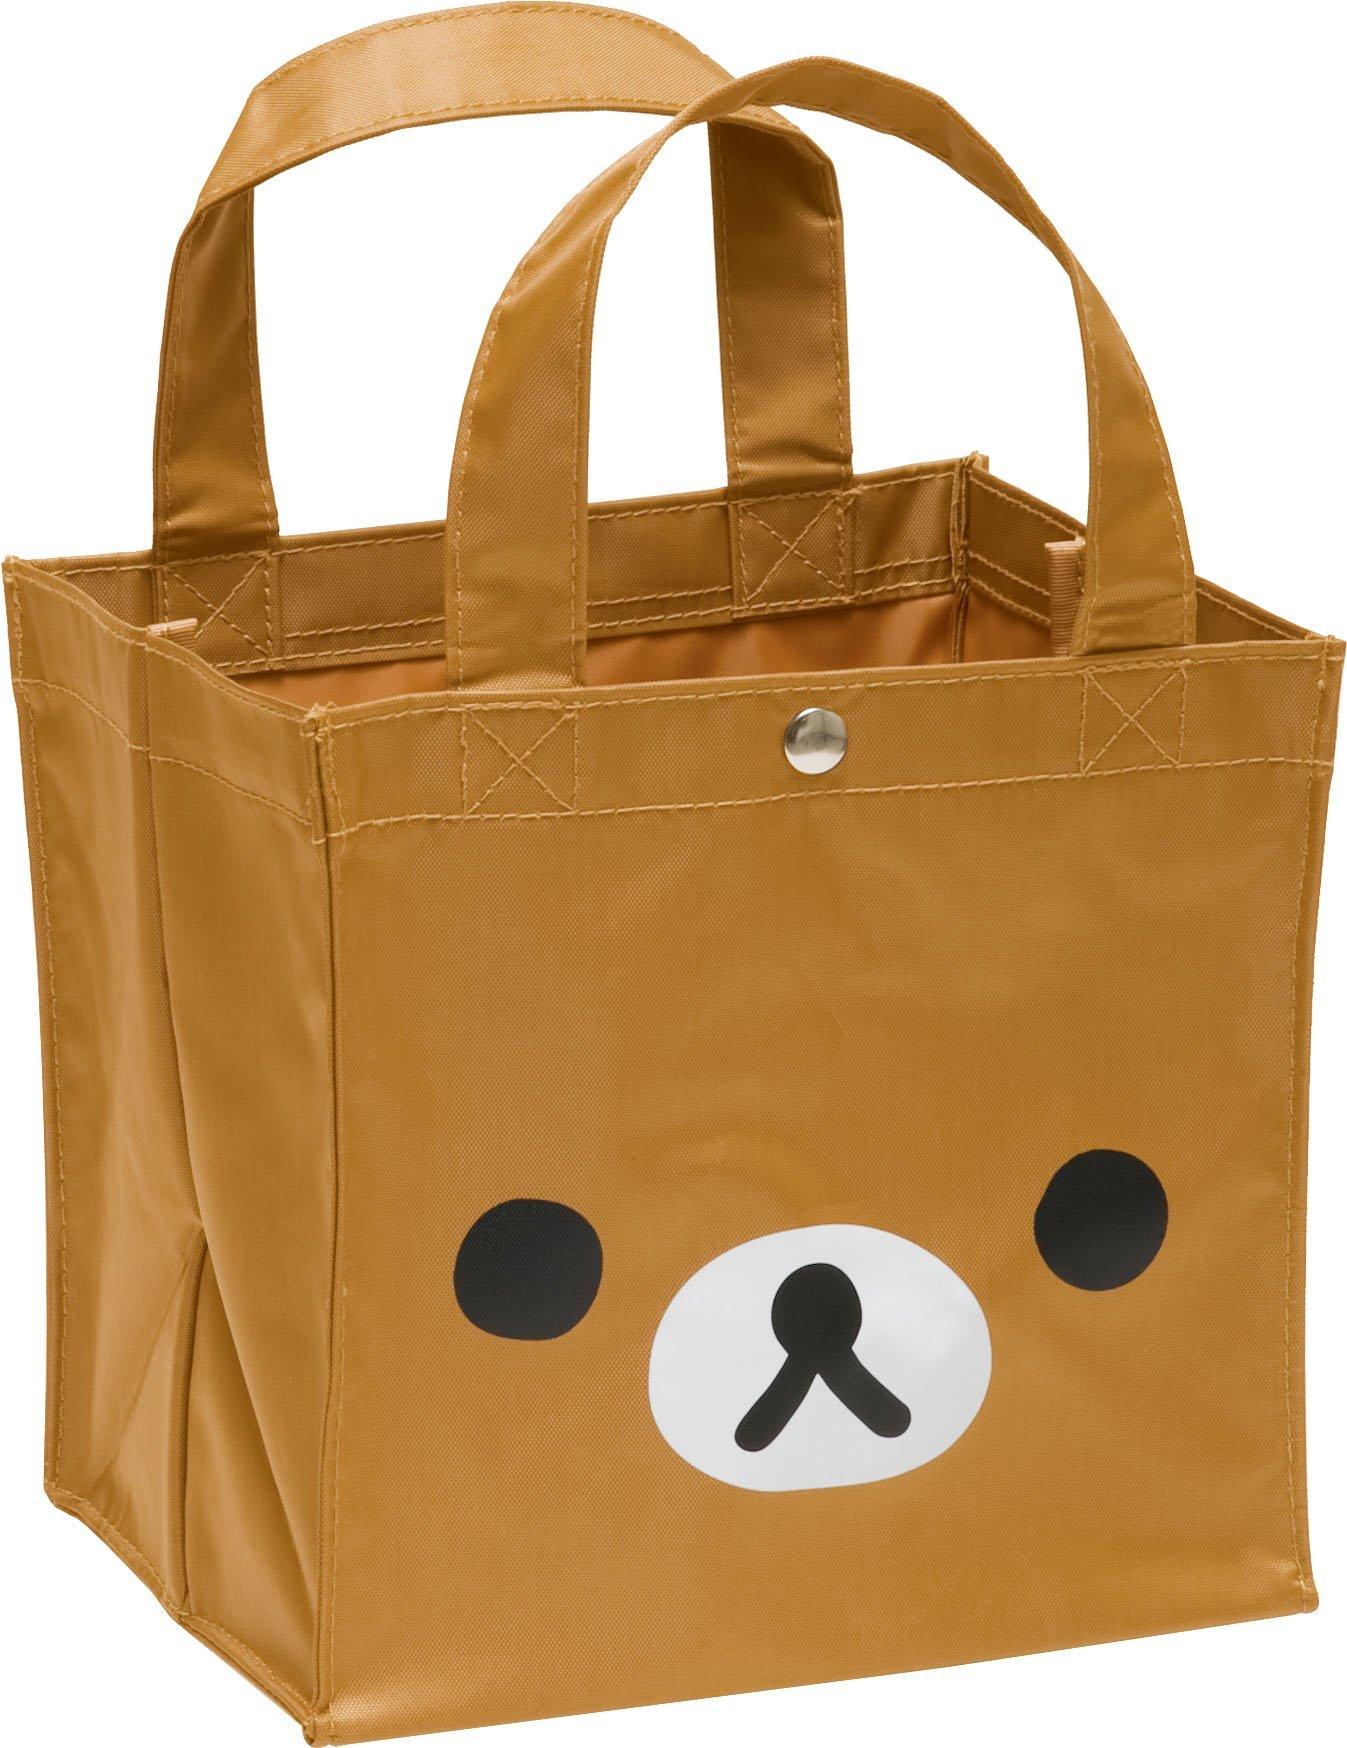 San-X Rilakkuma Lunch Tote Bag (CS59201)